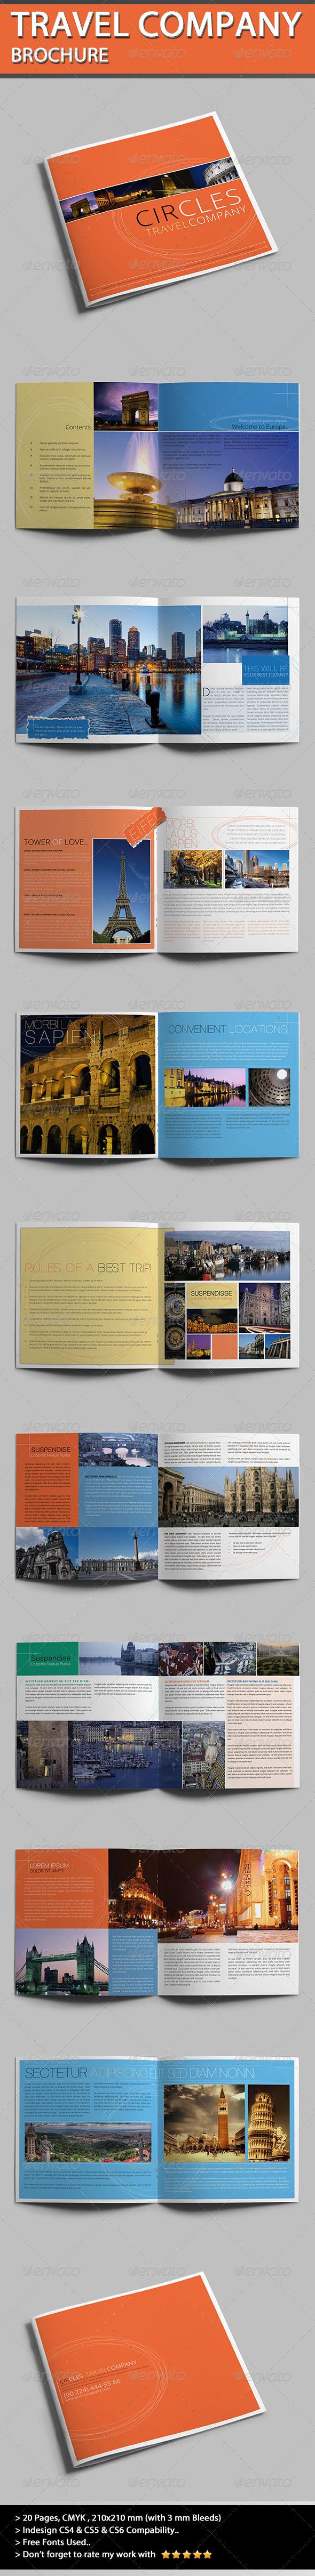 Travel Company Brochure - Circles - Informational Brochures